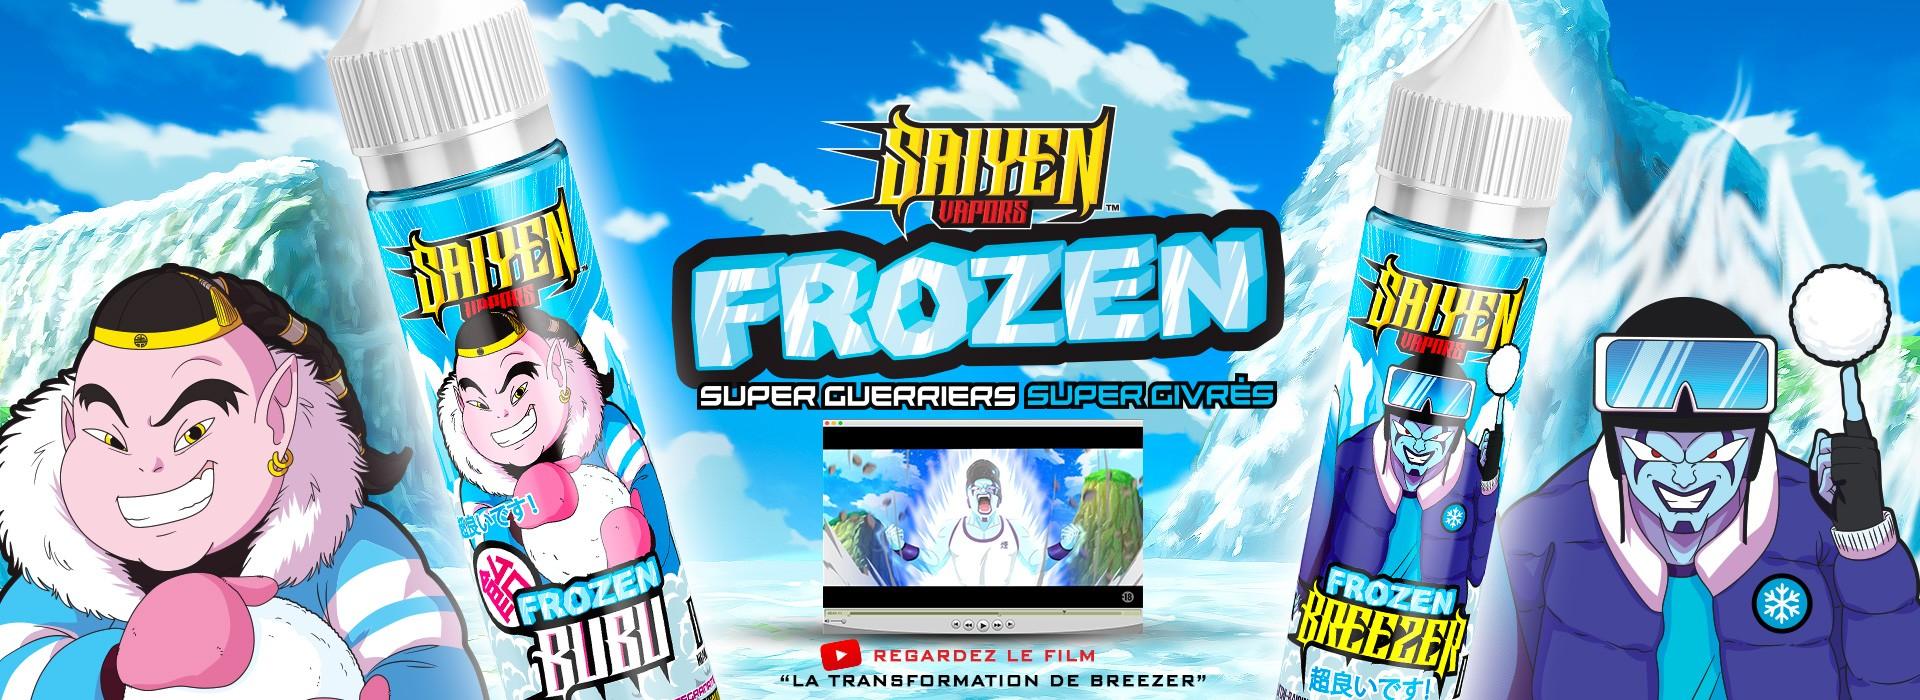 Frozen Breezer et Frozen Bubu arrivent !